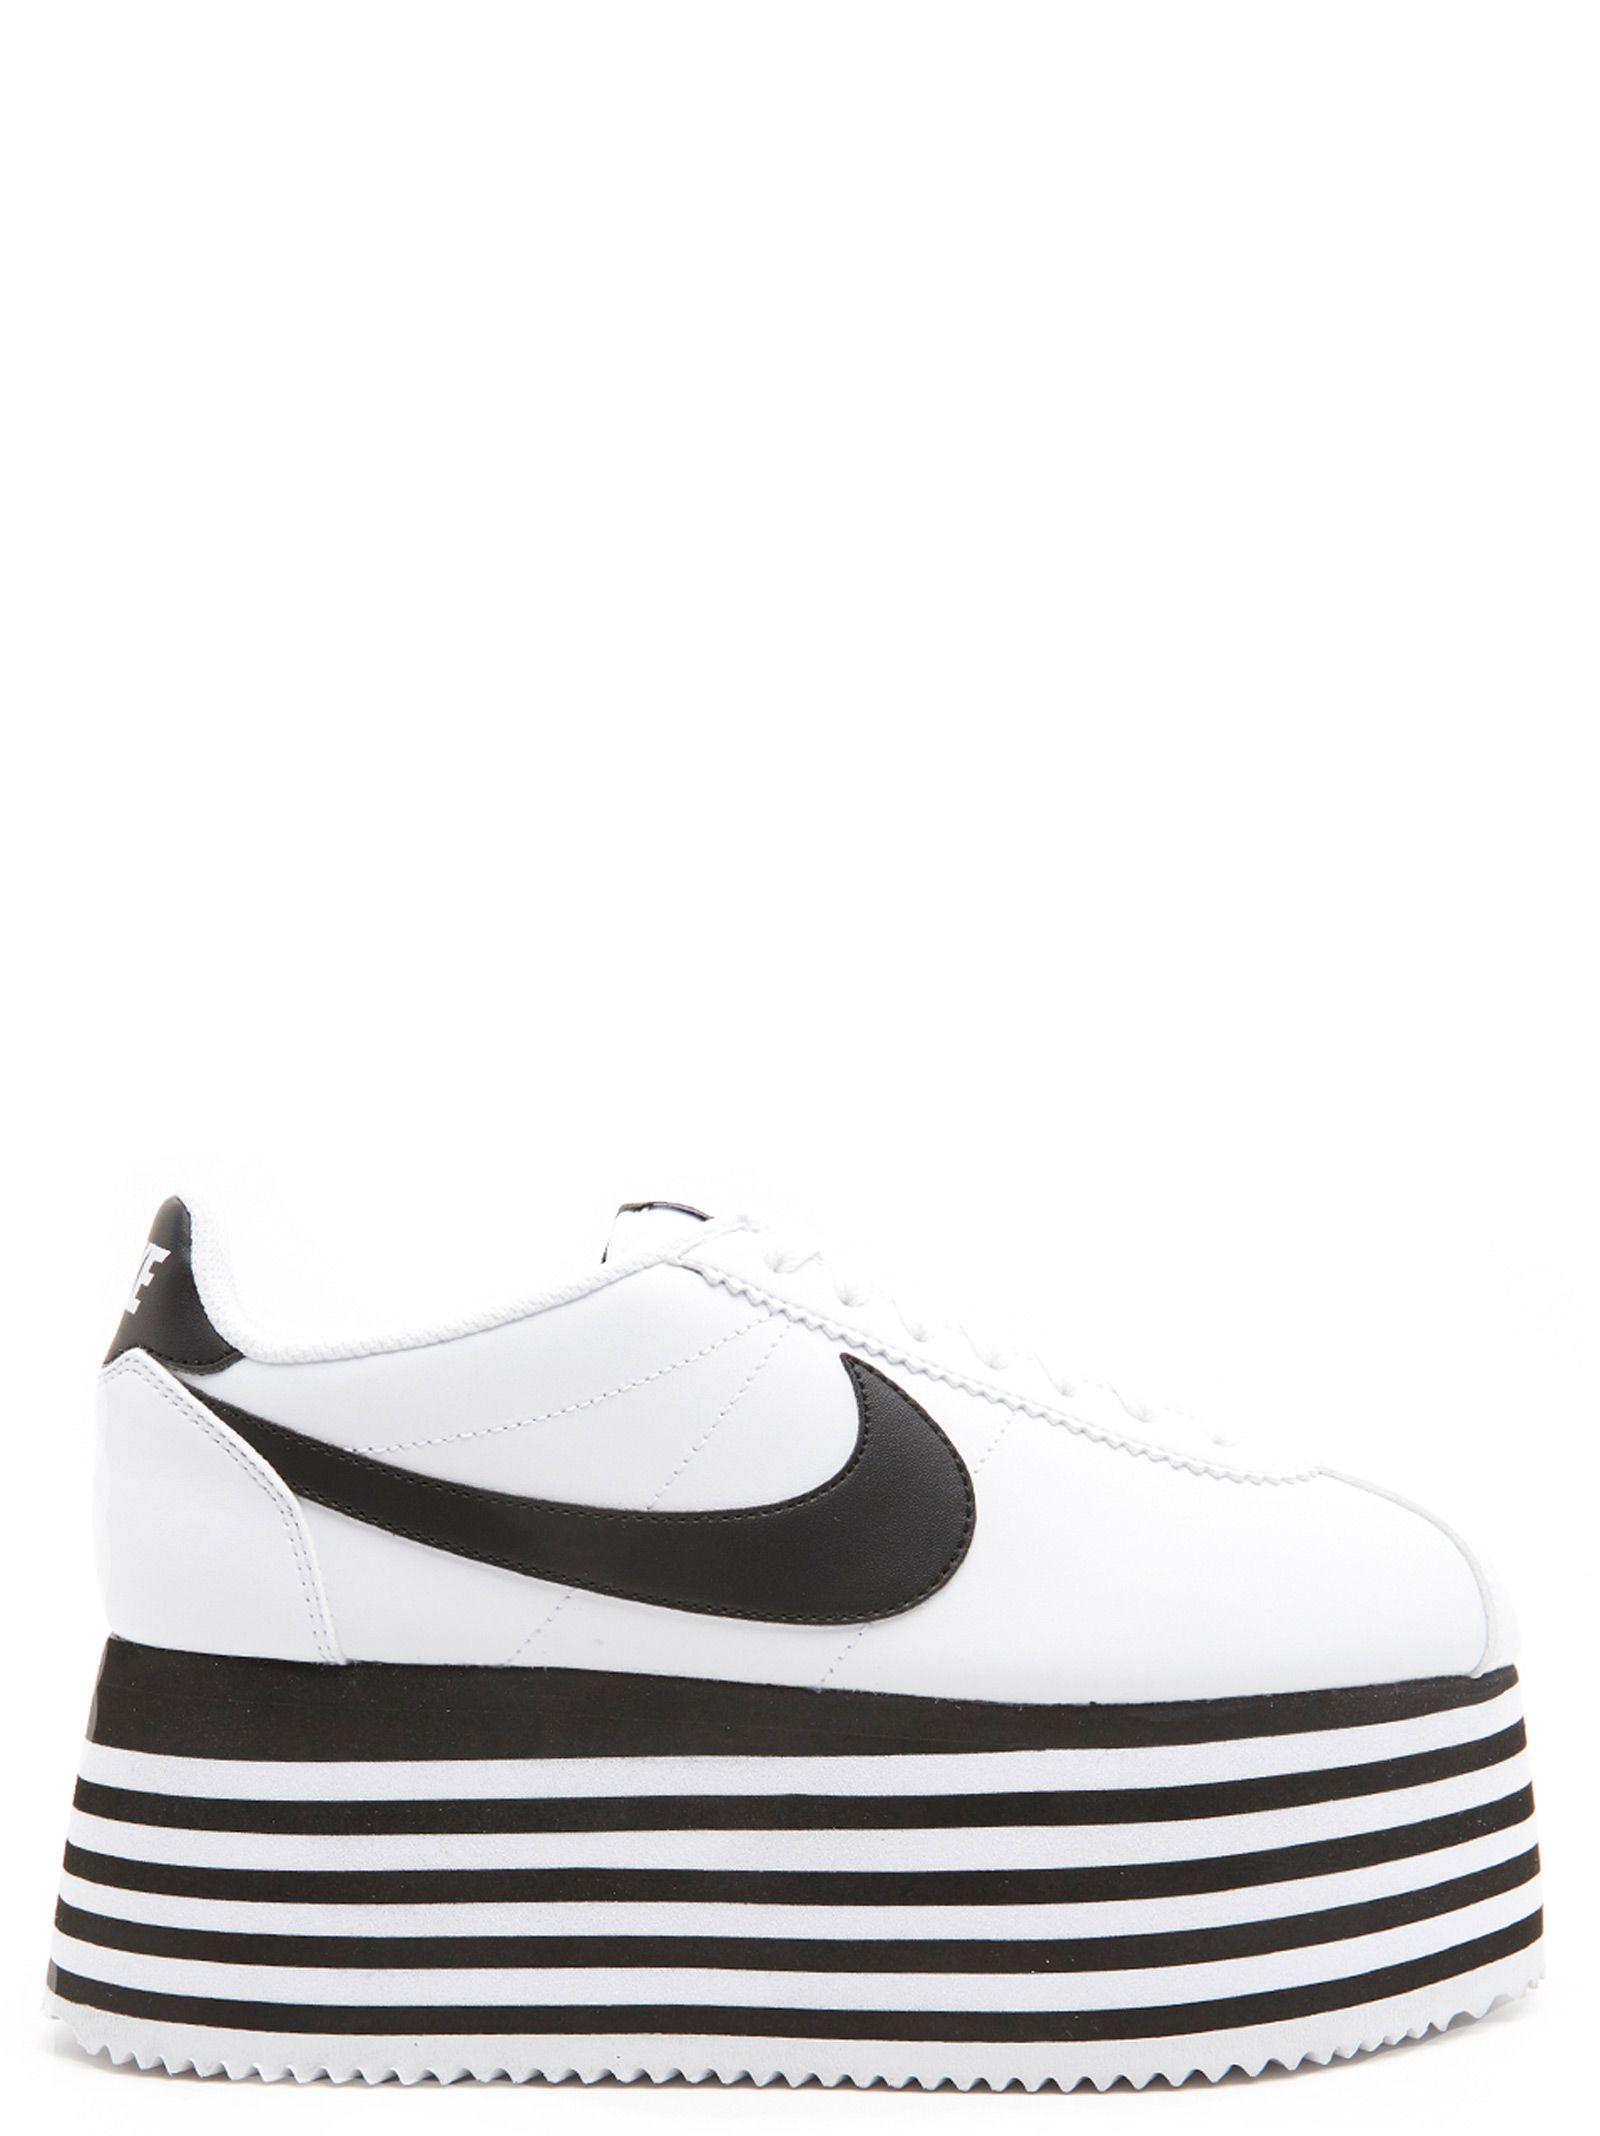 Comme Des Garçons X Nike Cortez Striped Wedge Platform Sneakers in White